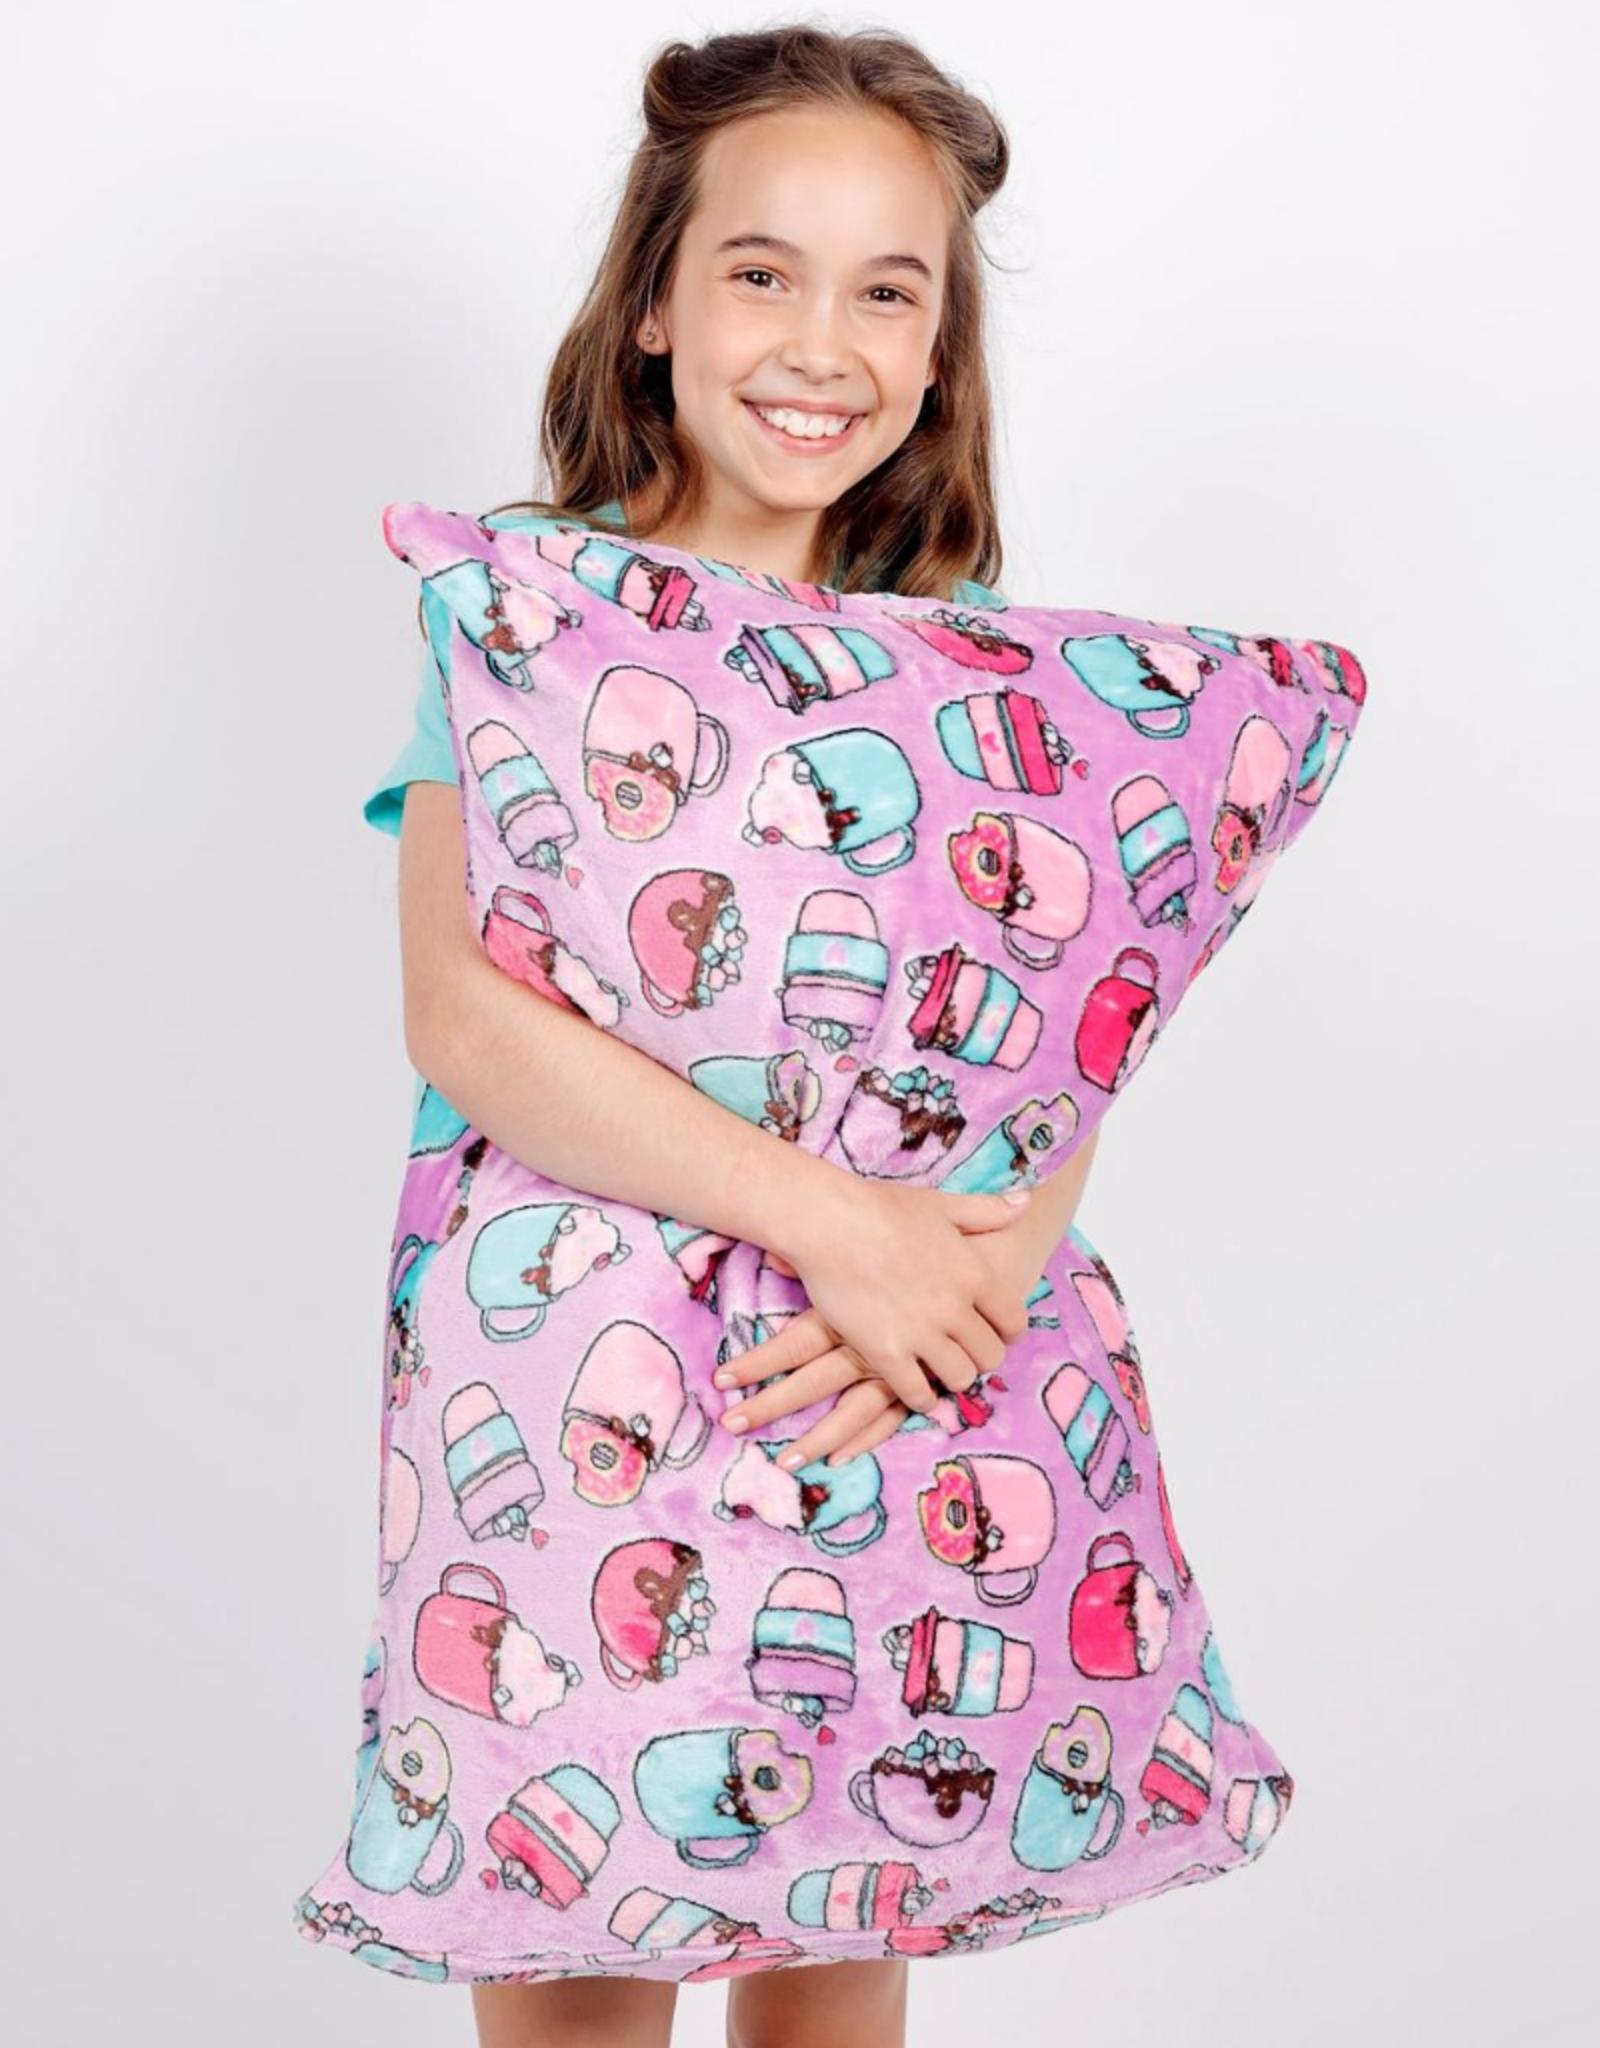 Candy Pink Hot Chocolate Pillowcase